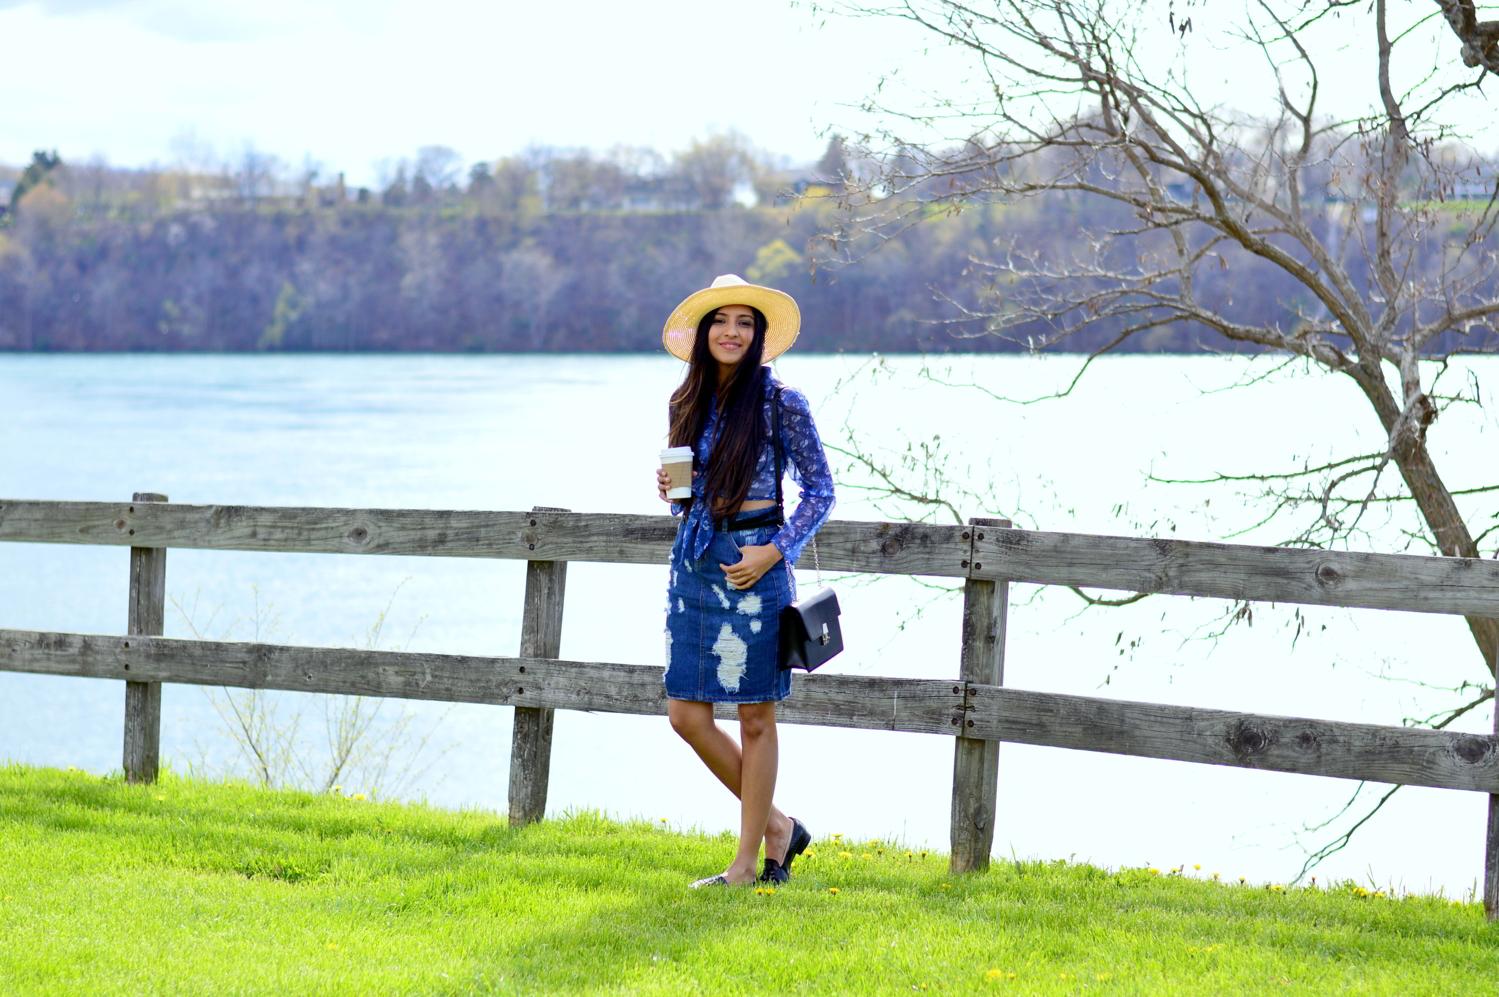 distressed-deim-skirt-retro-inspired-florals-outfit-lewiston-new-york-travel 5